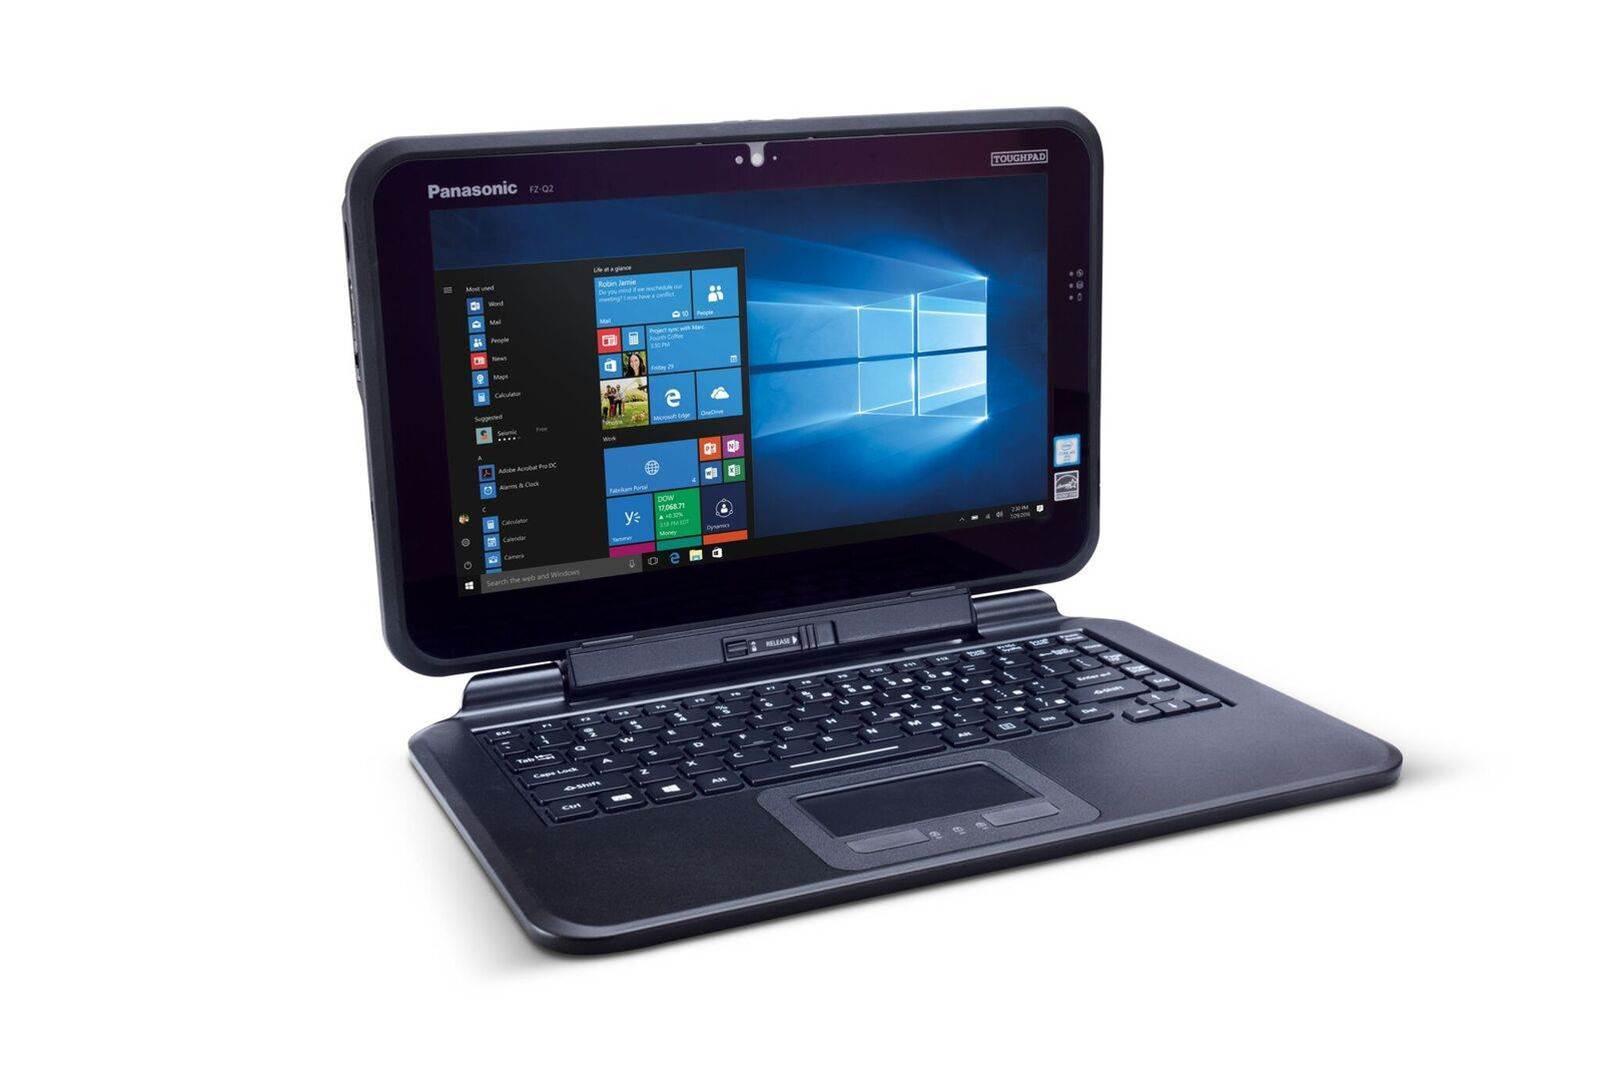 Panasonic launches new Toughpad FZ-Q2 semi-rugged convertible PC